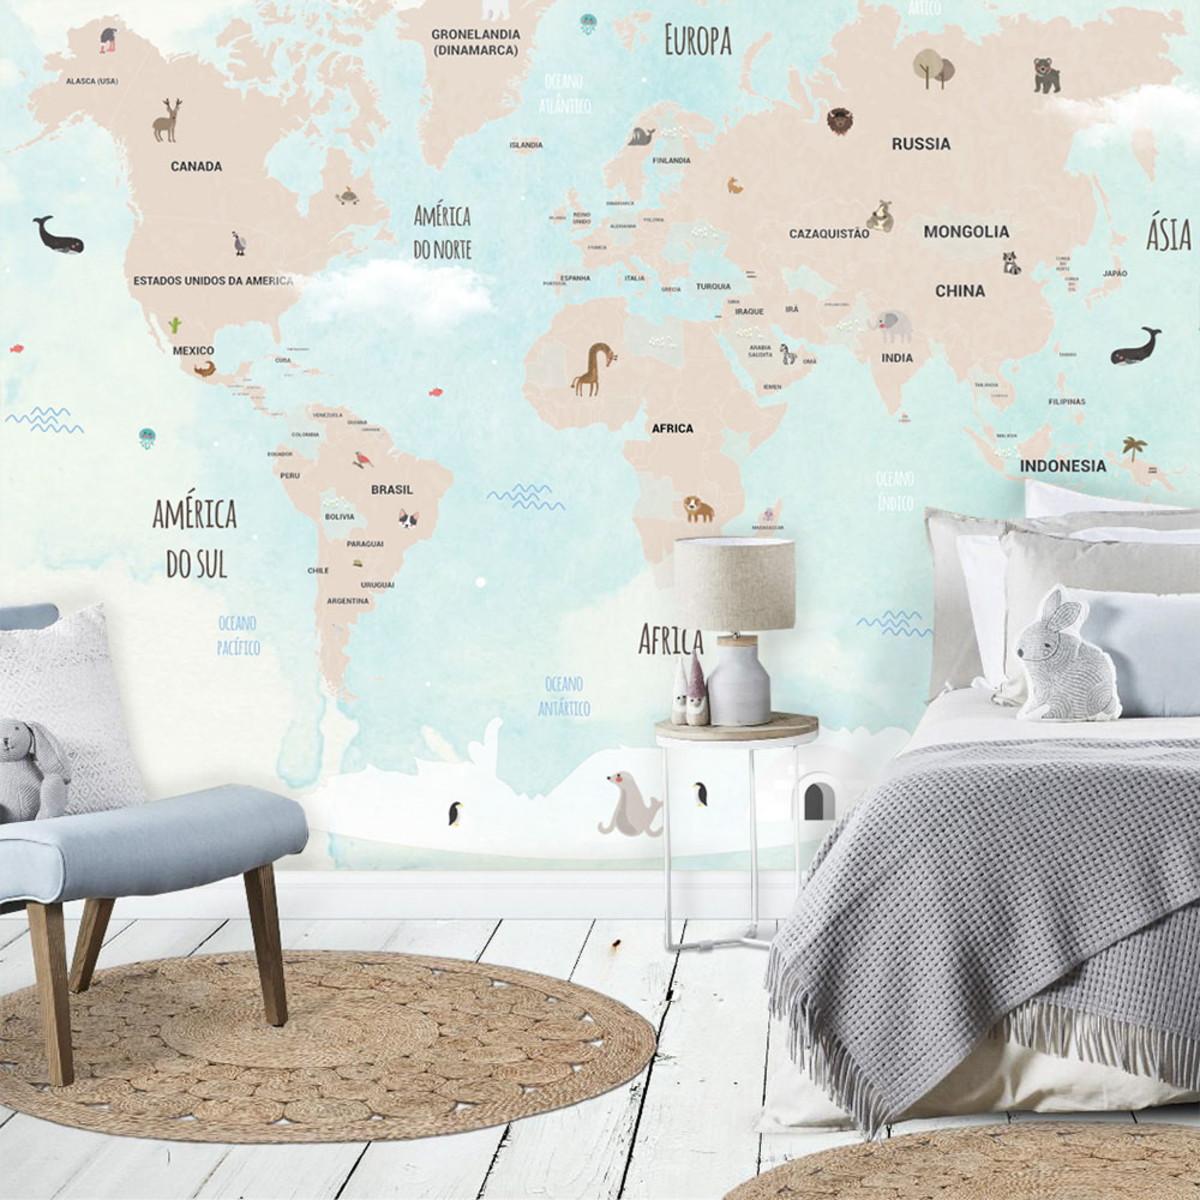 Mural adesivo mapa mundi infantil 2 32 x 3 00m no elo7 - Mural mapa mundi ...